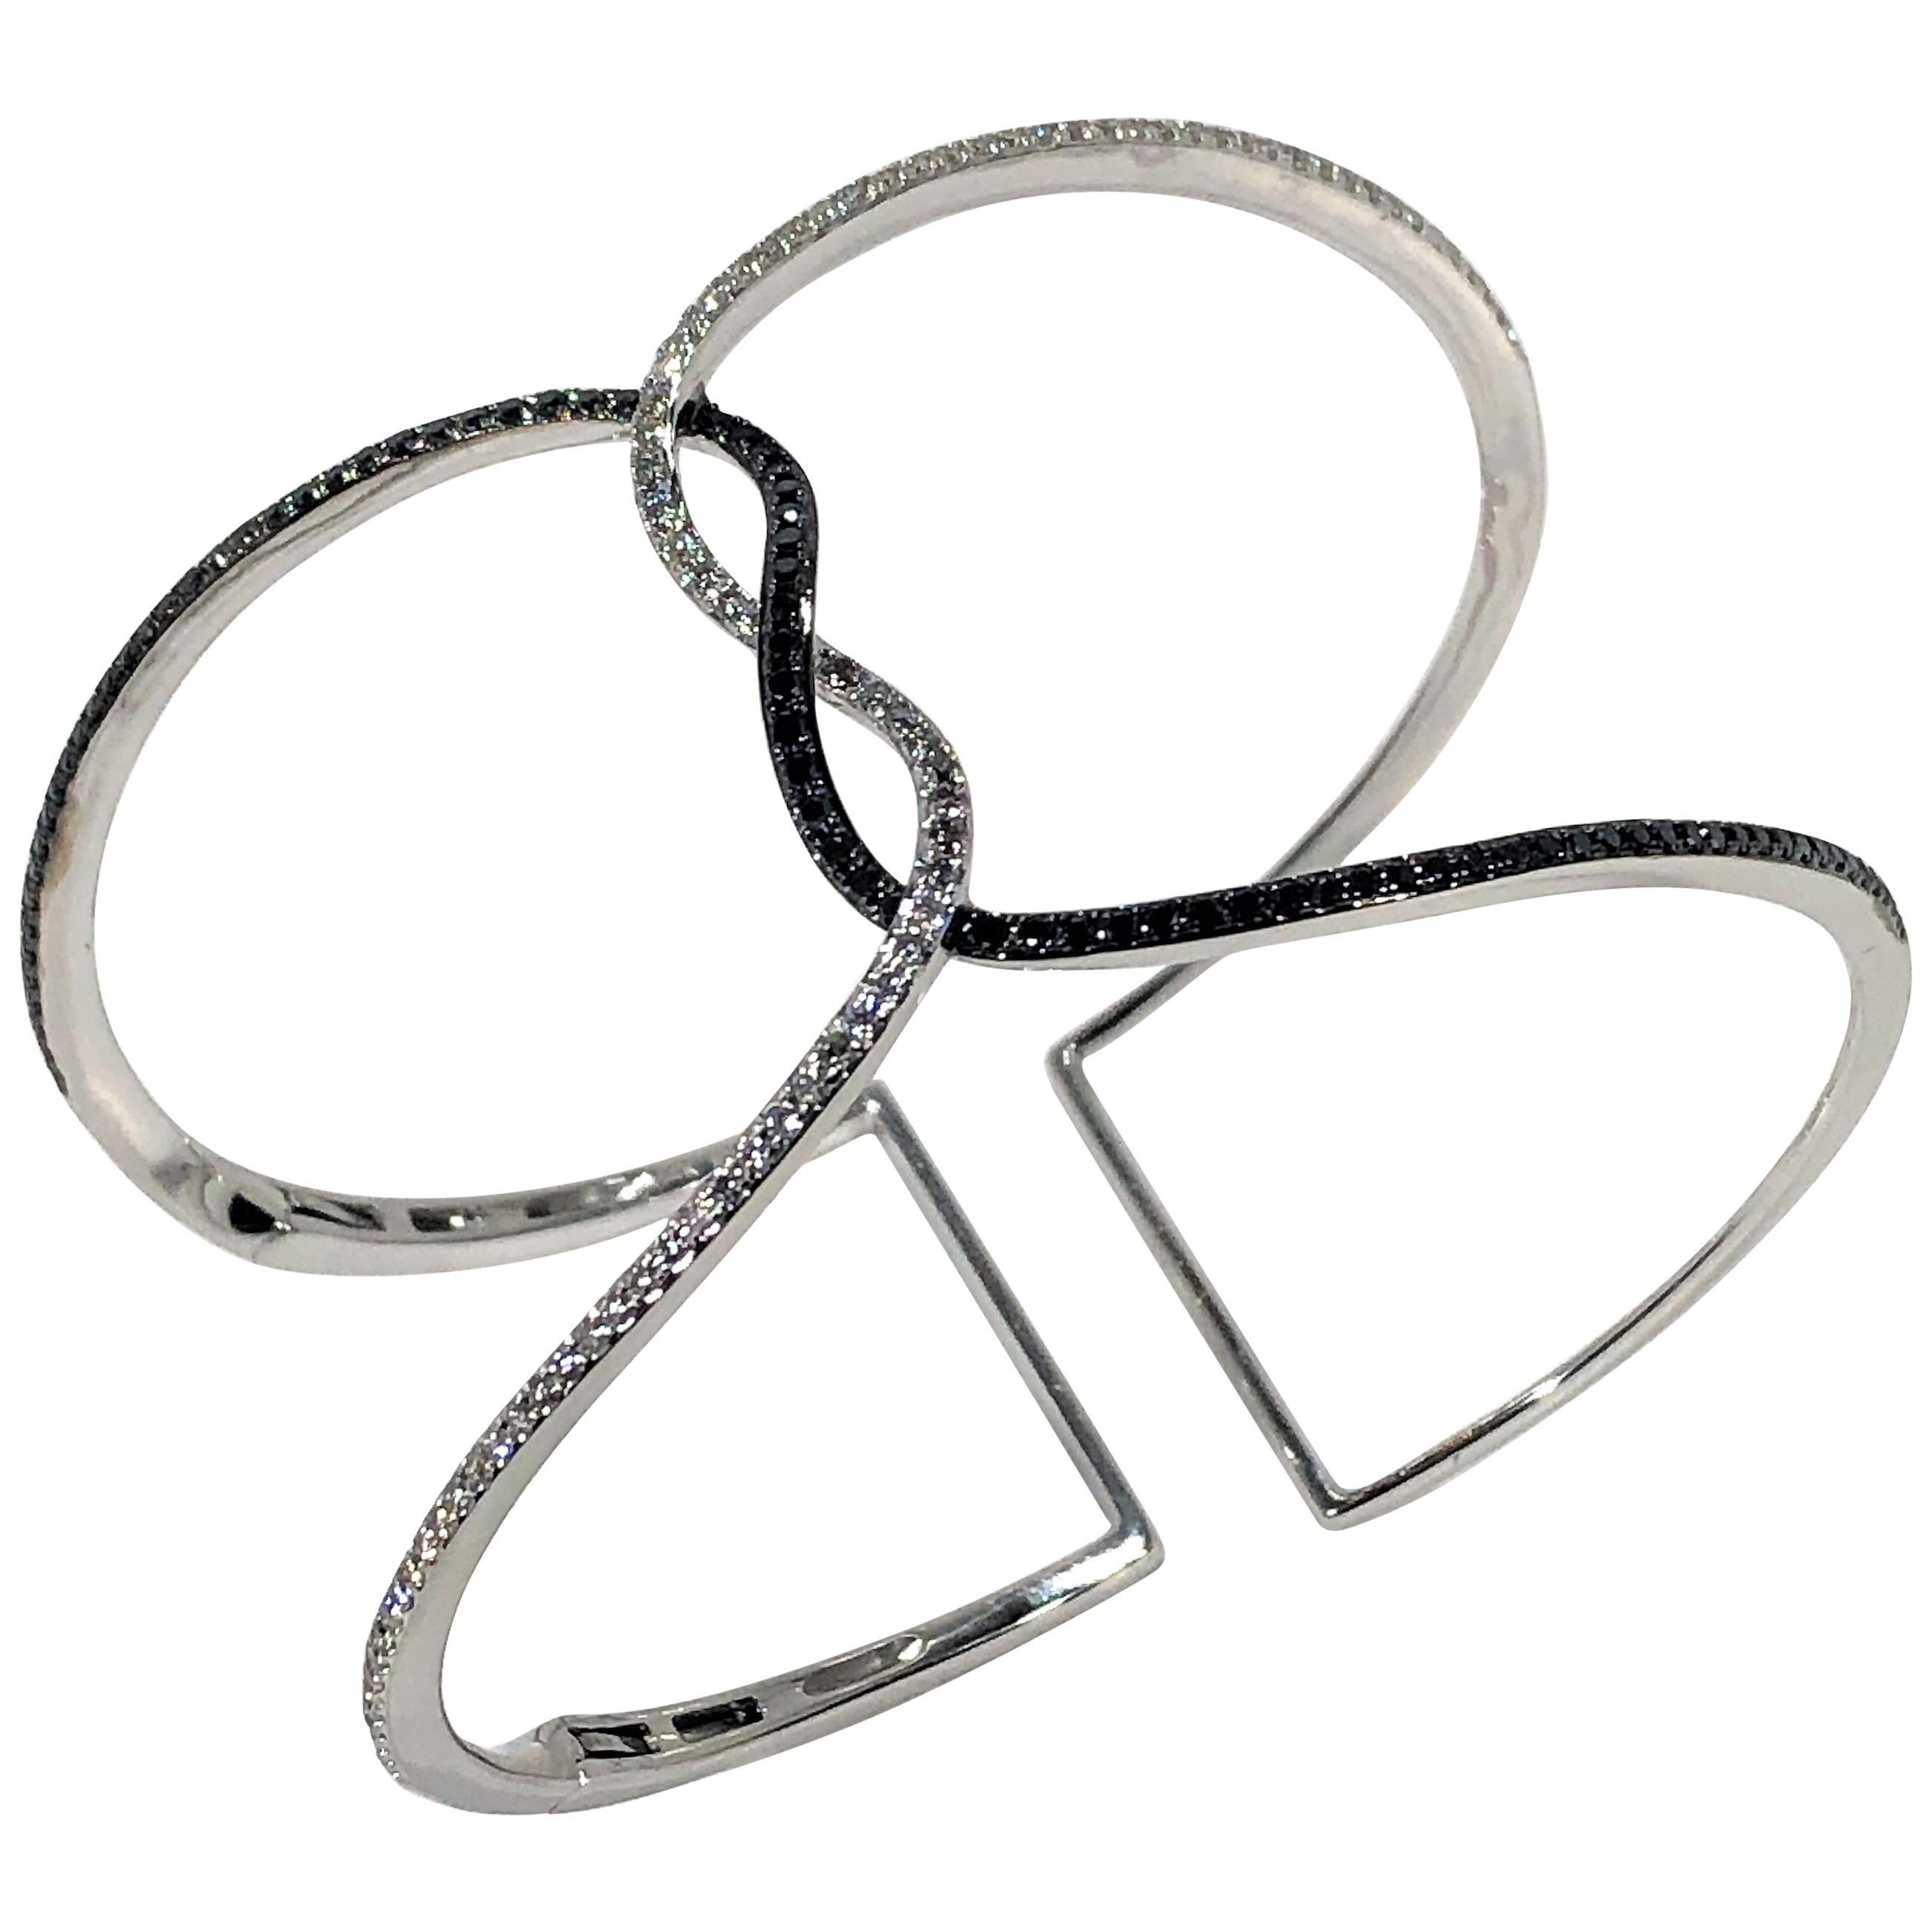 Stylish White Gold Black and White Diamond Cuff by Designer Effy